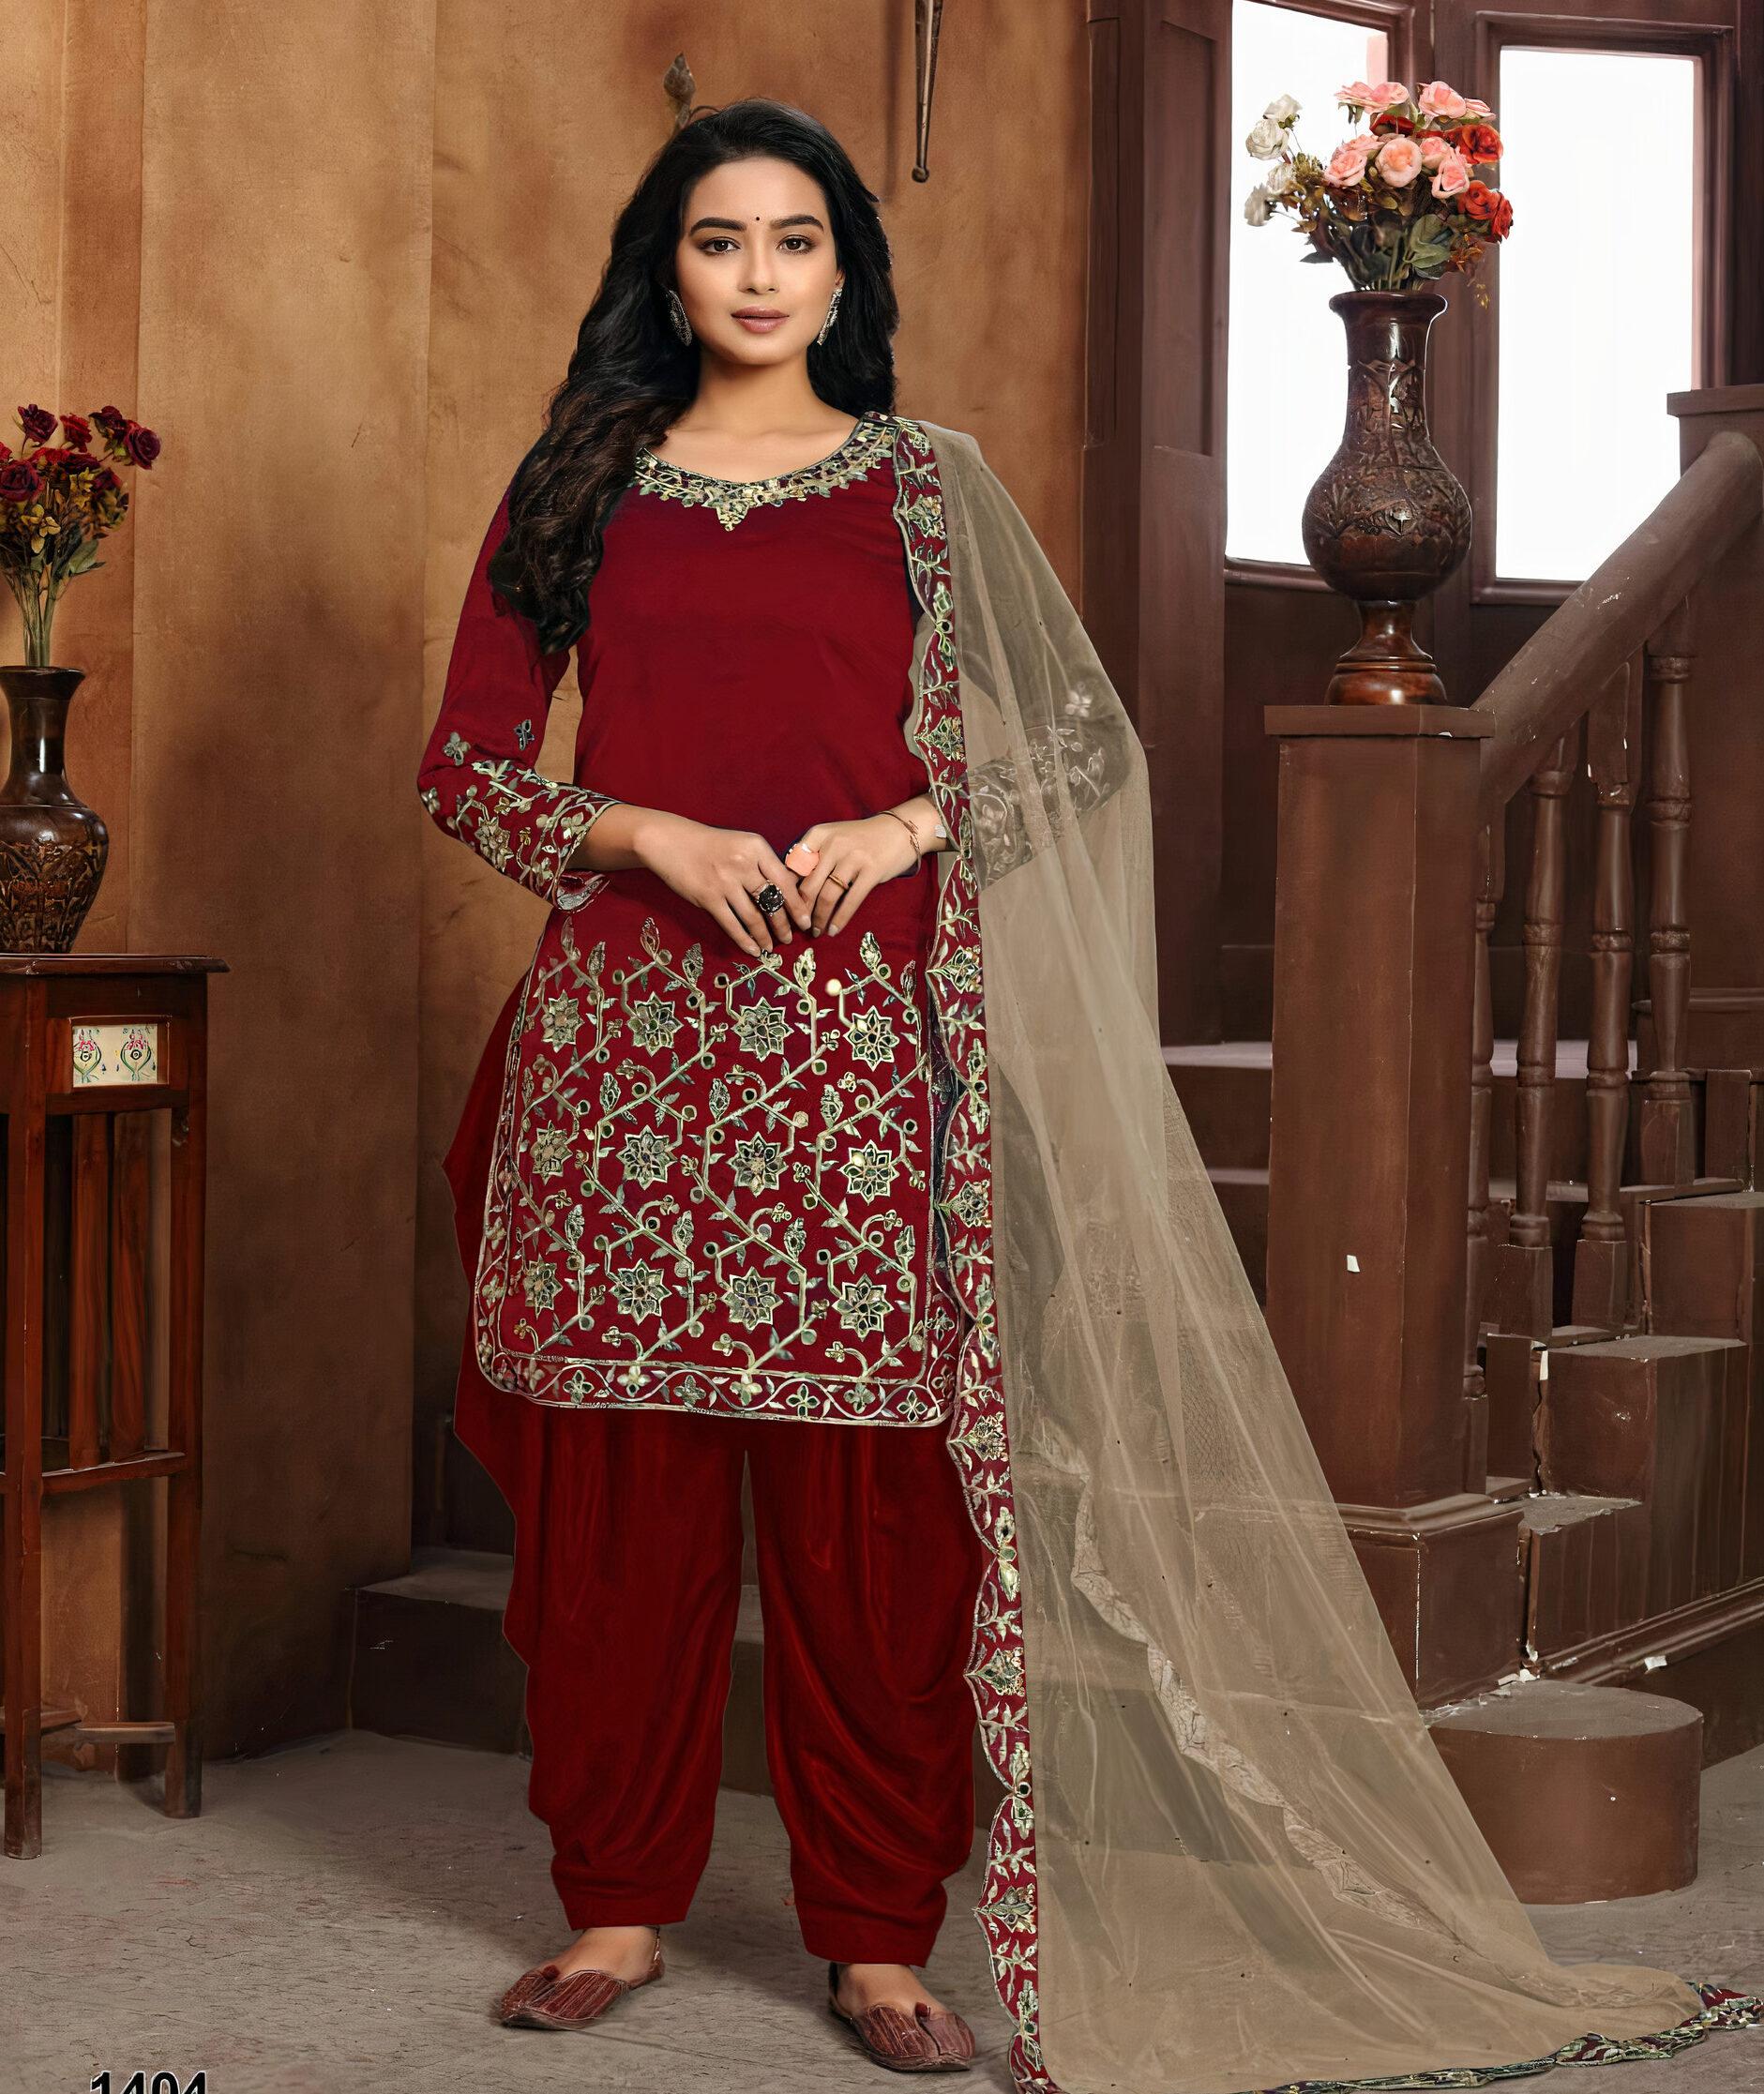 Heavy Stone Work Salwar Suits for Bridal Wear